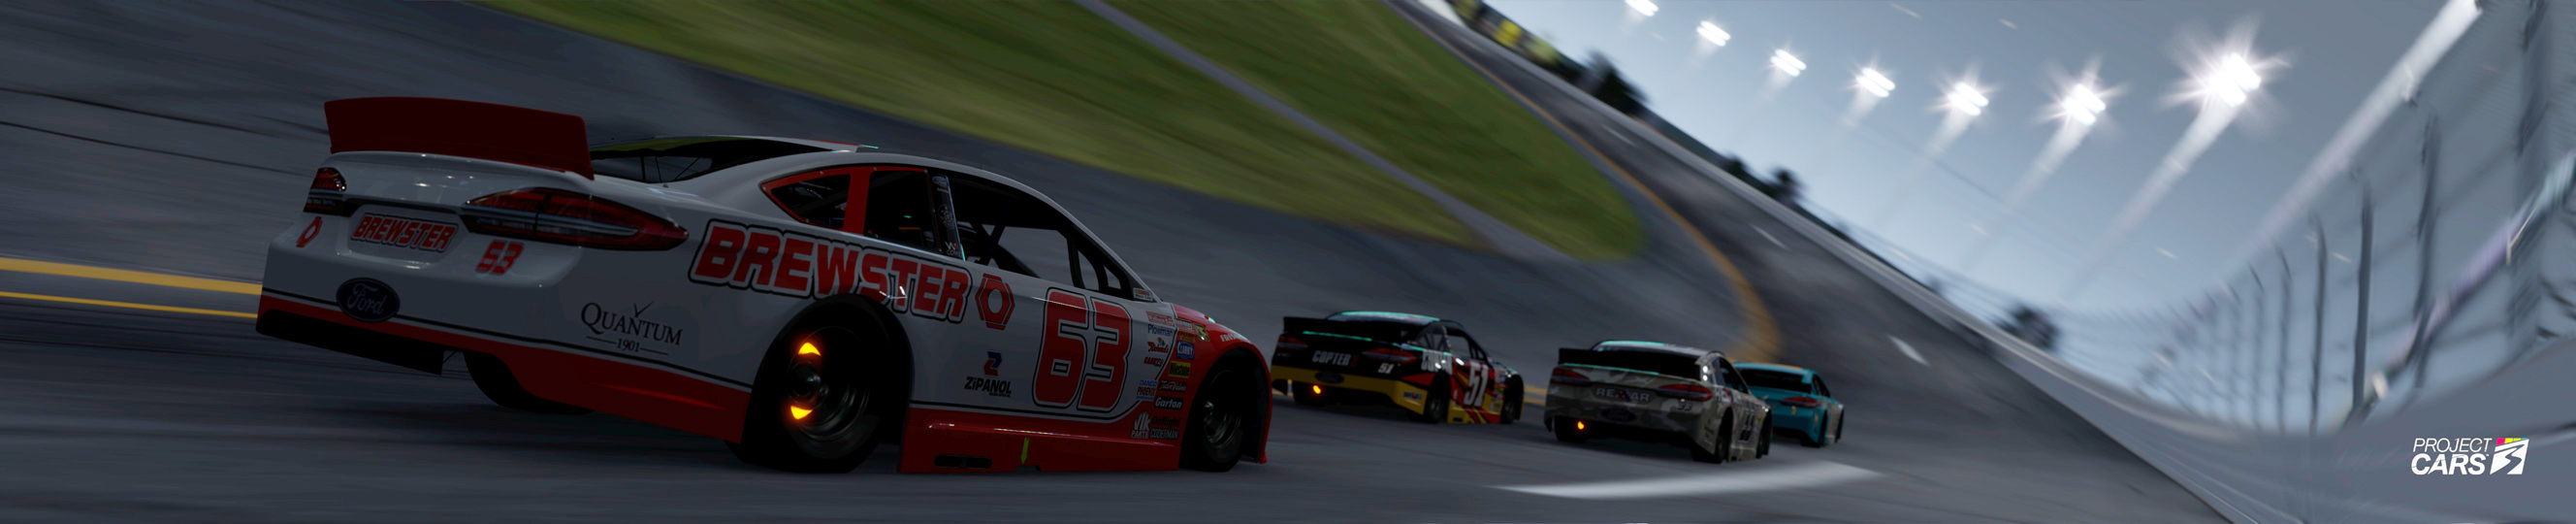 4 PROJECT CARS 3 NASCAR at DAYTONA crop copy.jpg